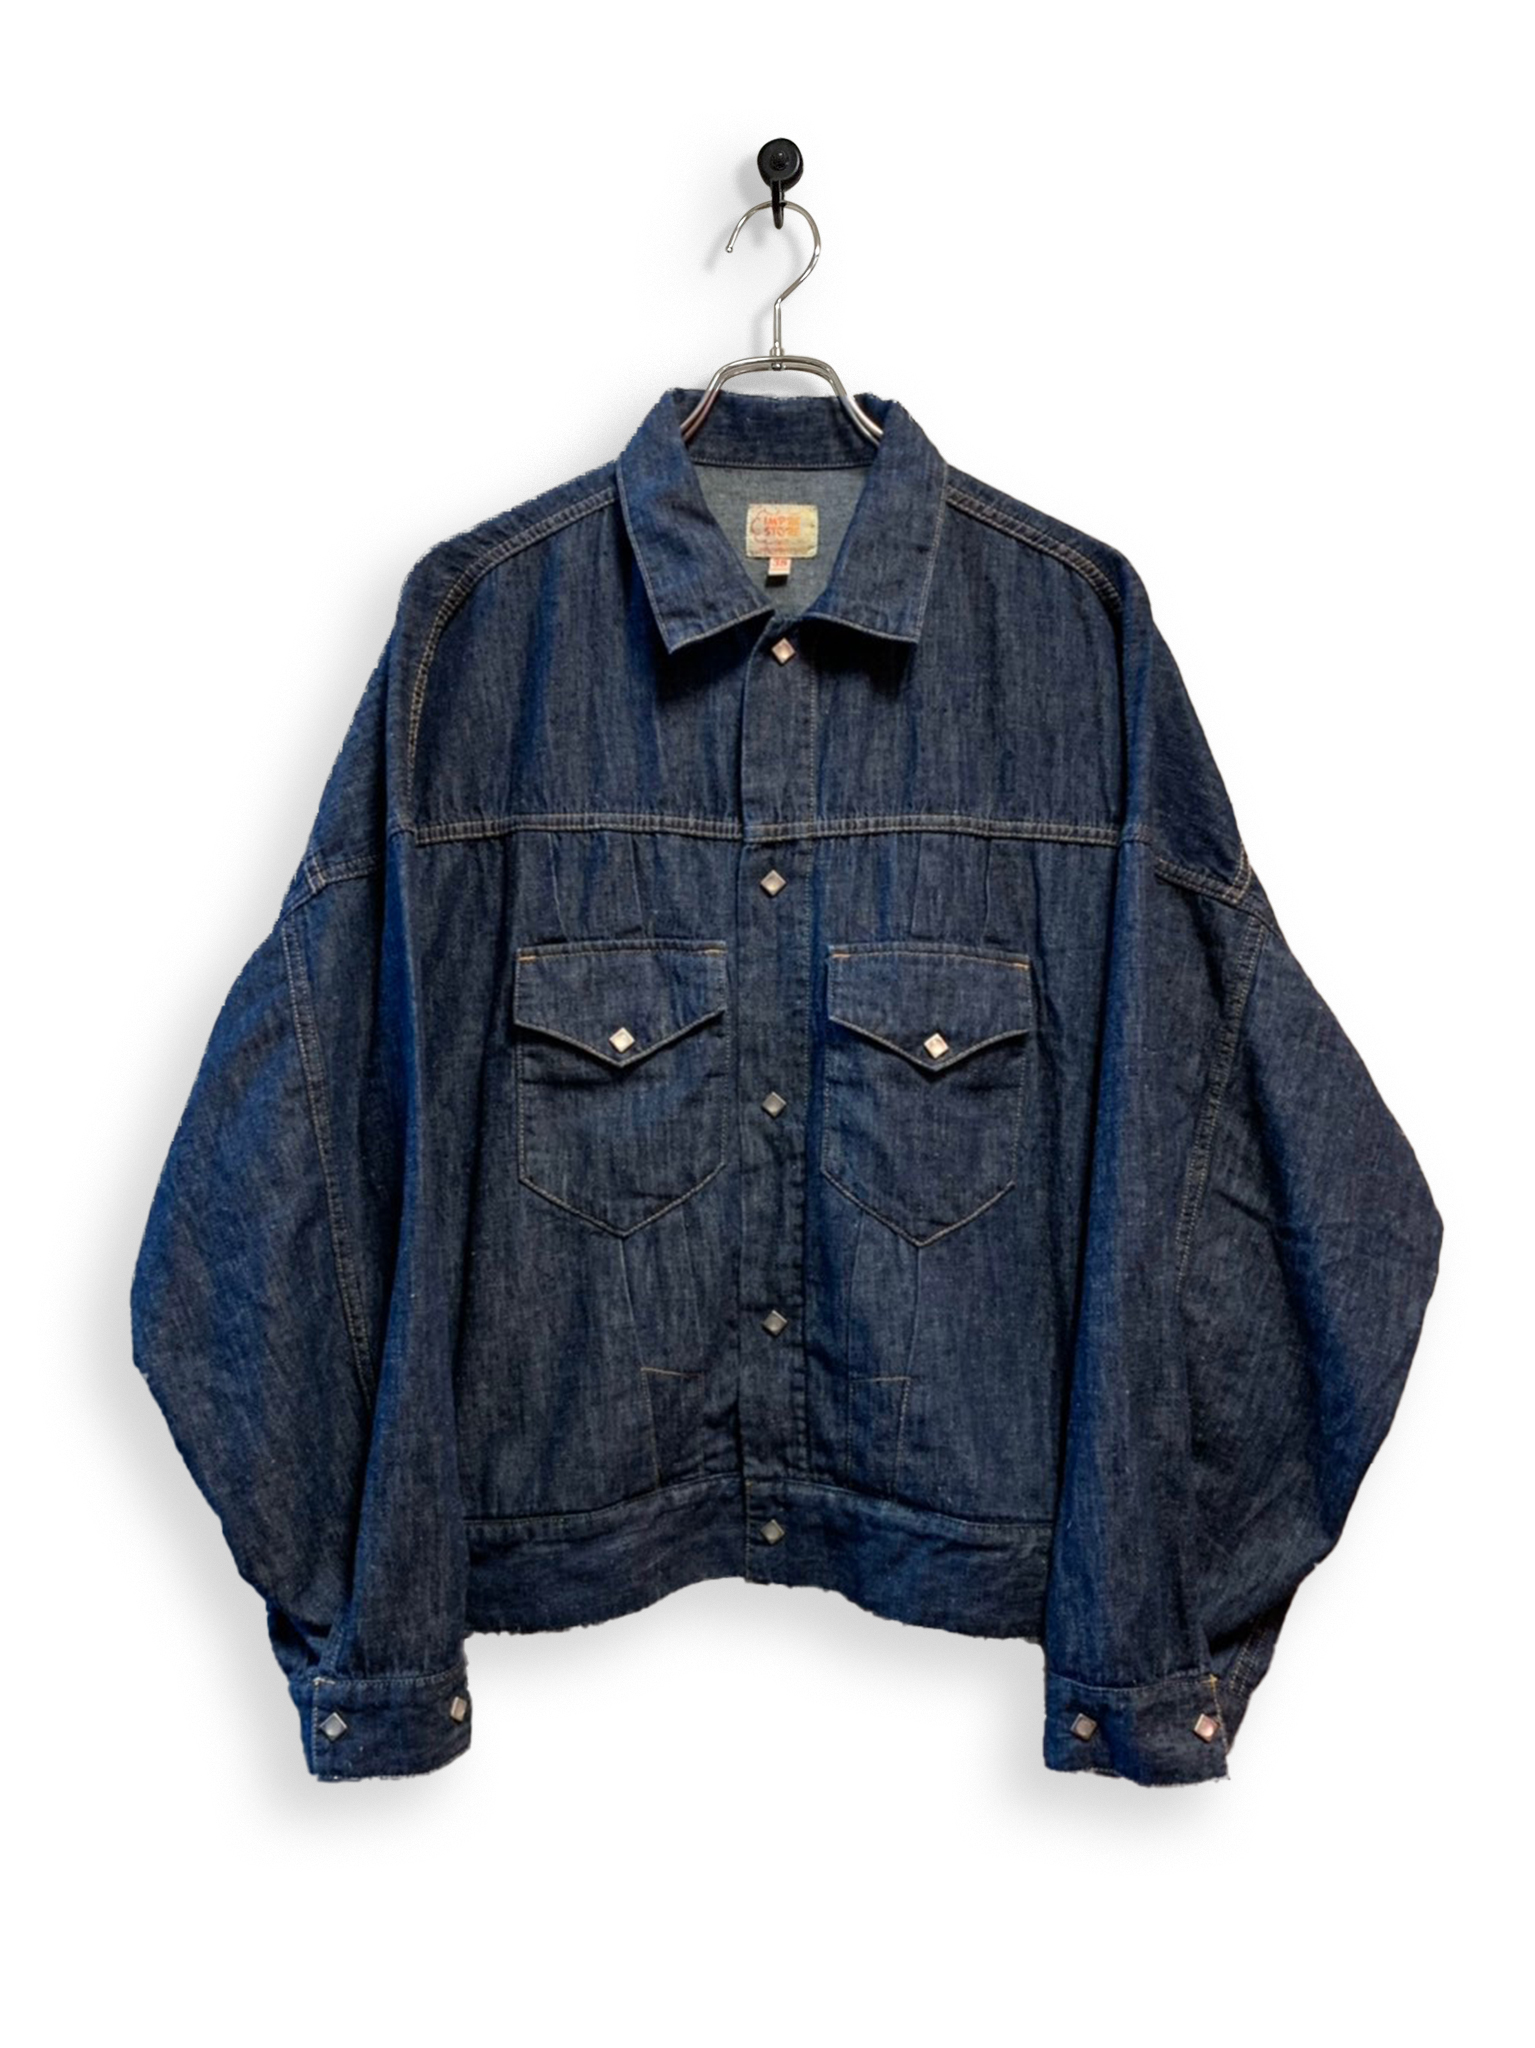 6.5oz Denim Western Short Jacket / one wash